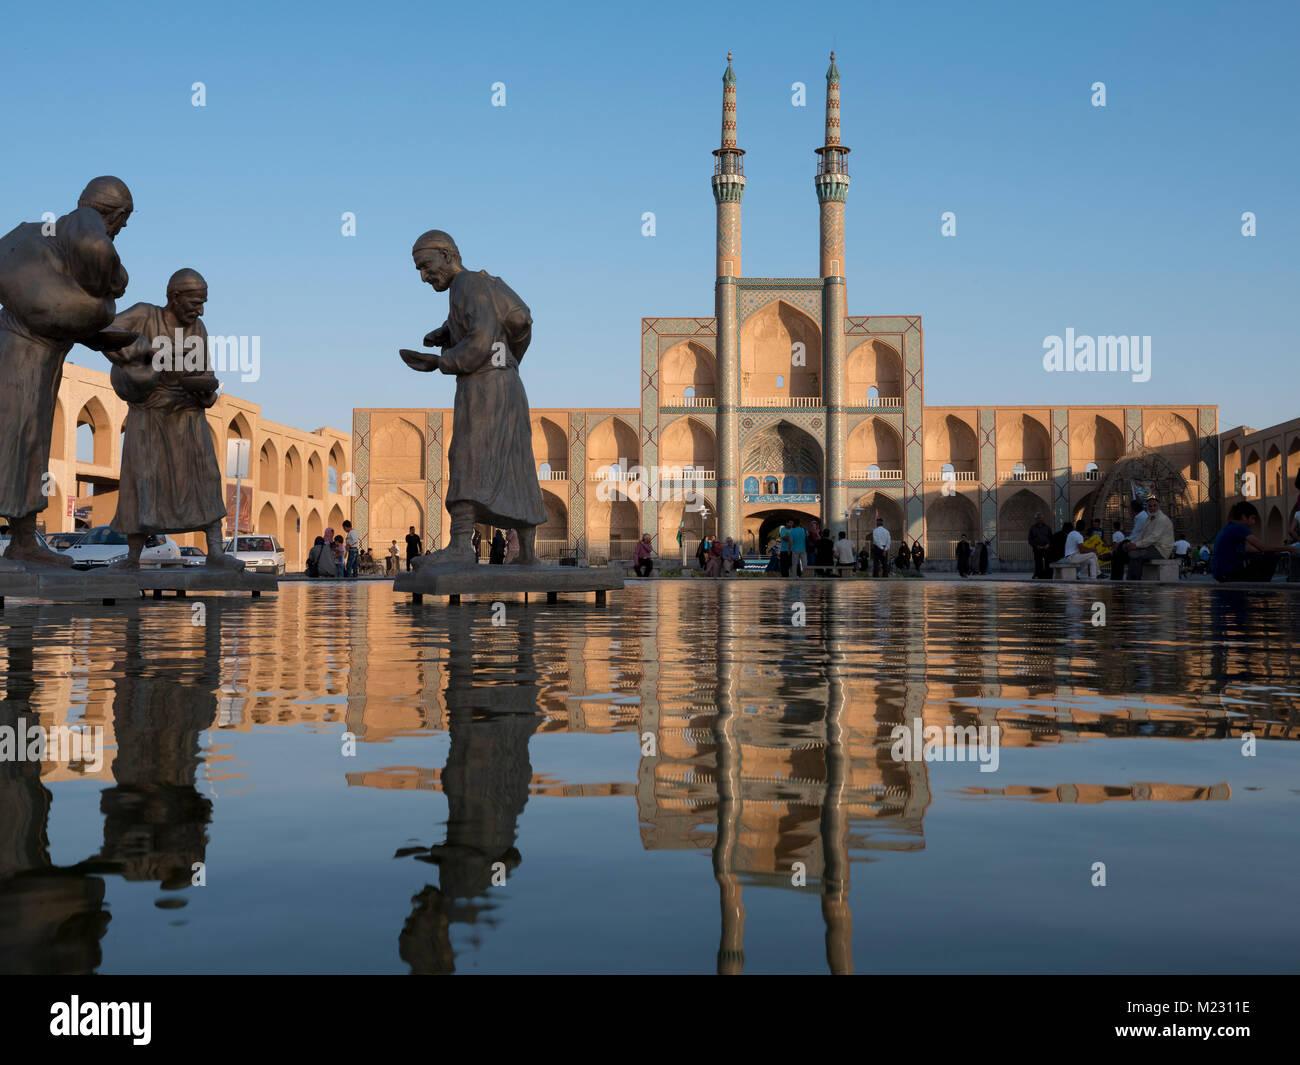 The Amir Chakhmaq Complex in Yazd, Yazd Province, Iran - Stock Image